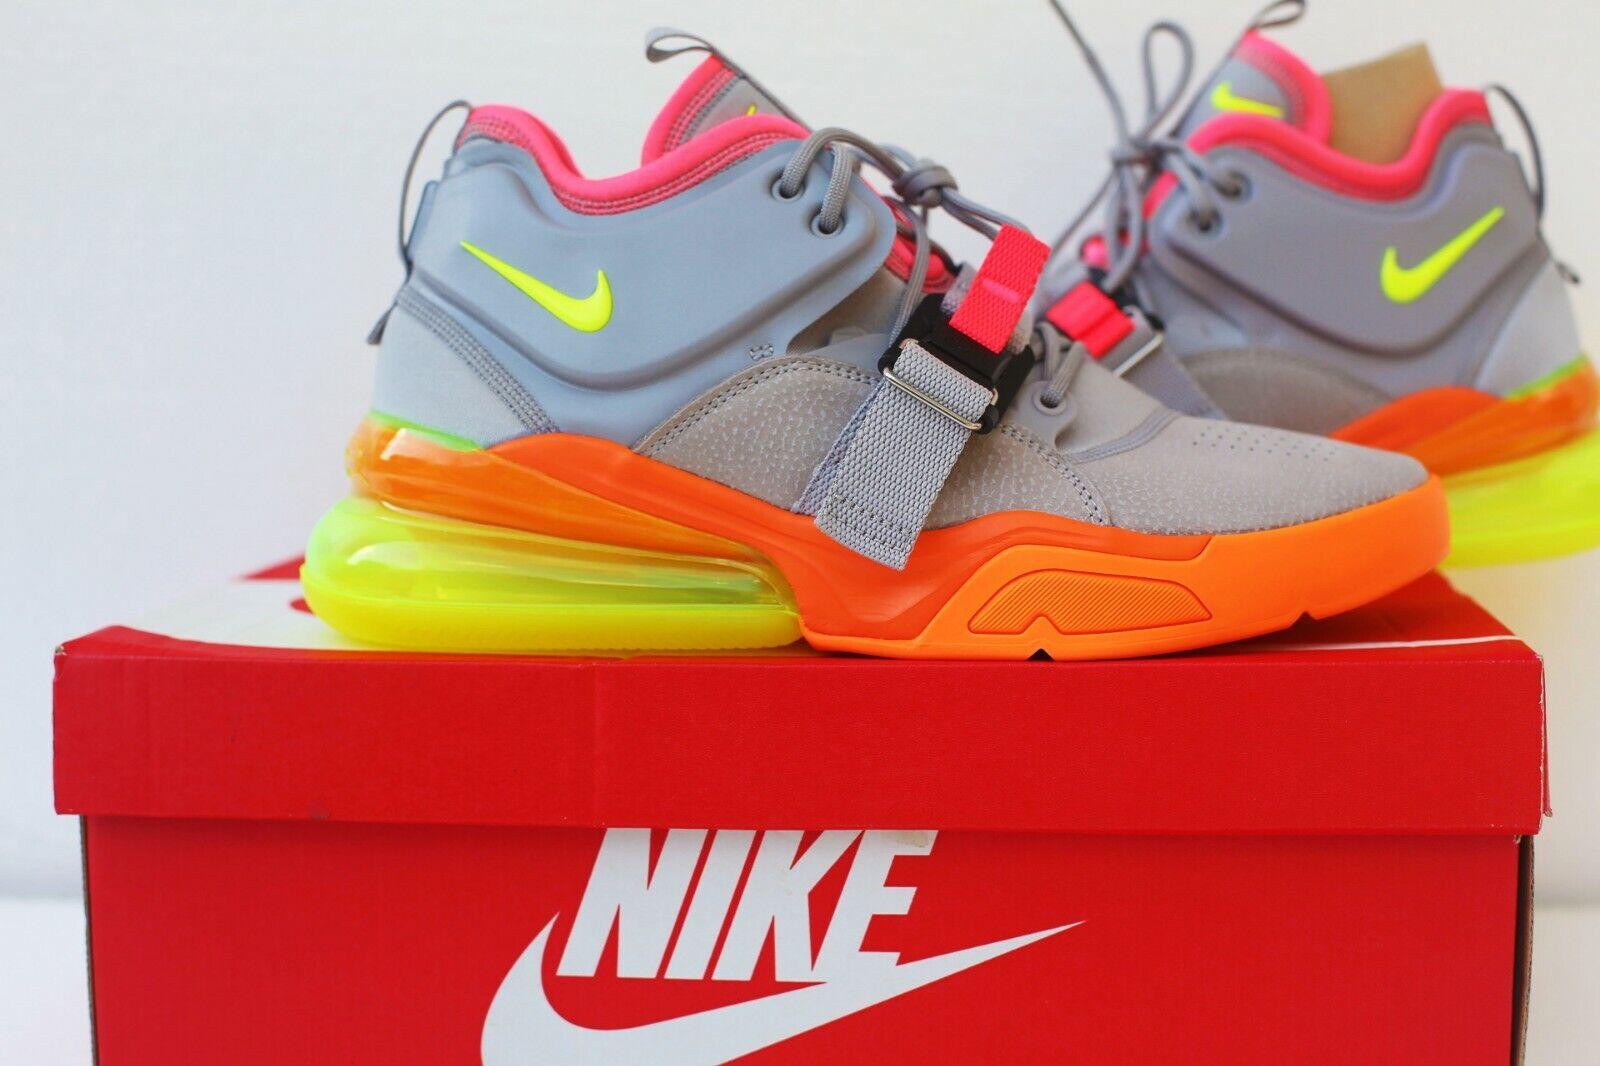 New Mens NIKE Air Force 270 Sneaker Grey Volt orange Size 10